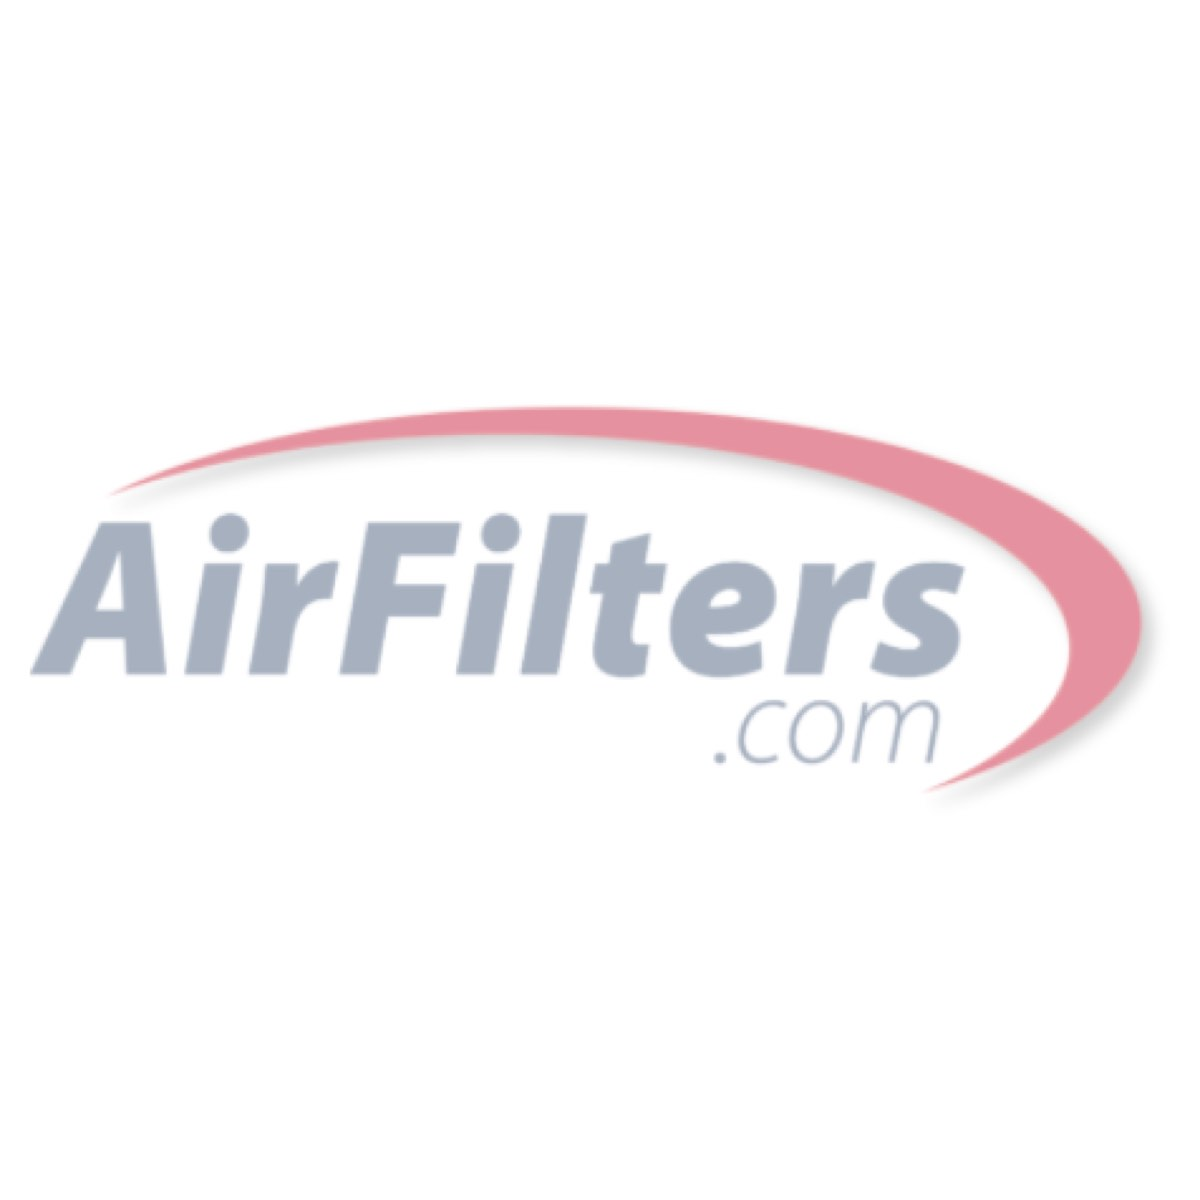 Accumulair Emerald MERV 6 Filters - 2 Inch